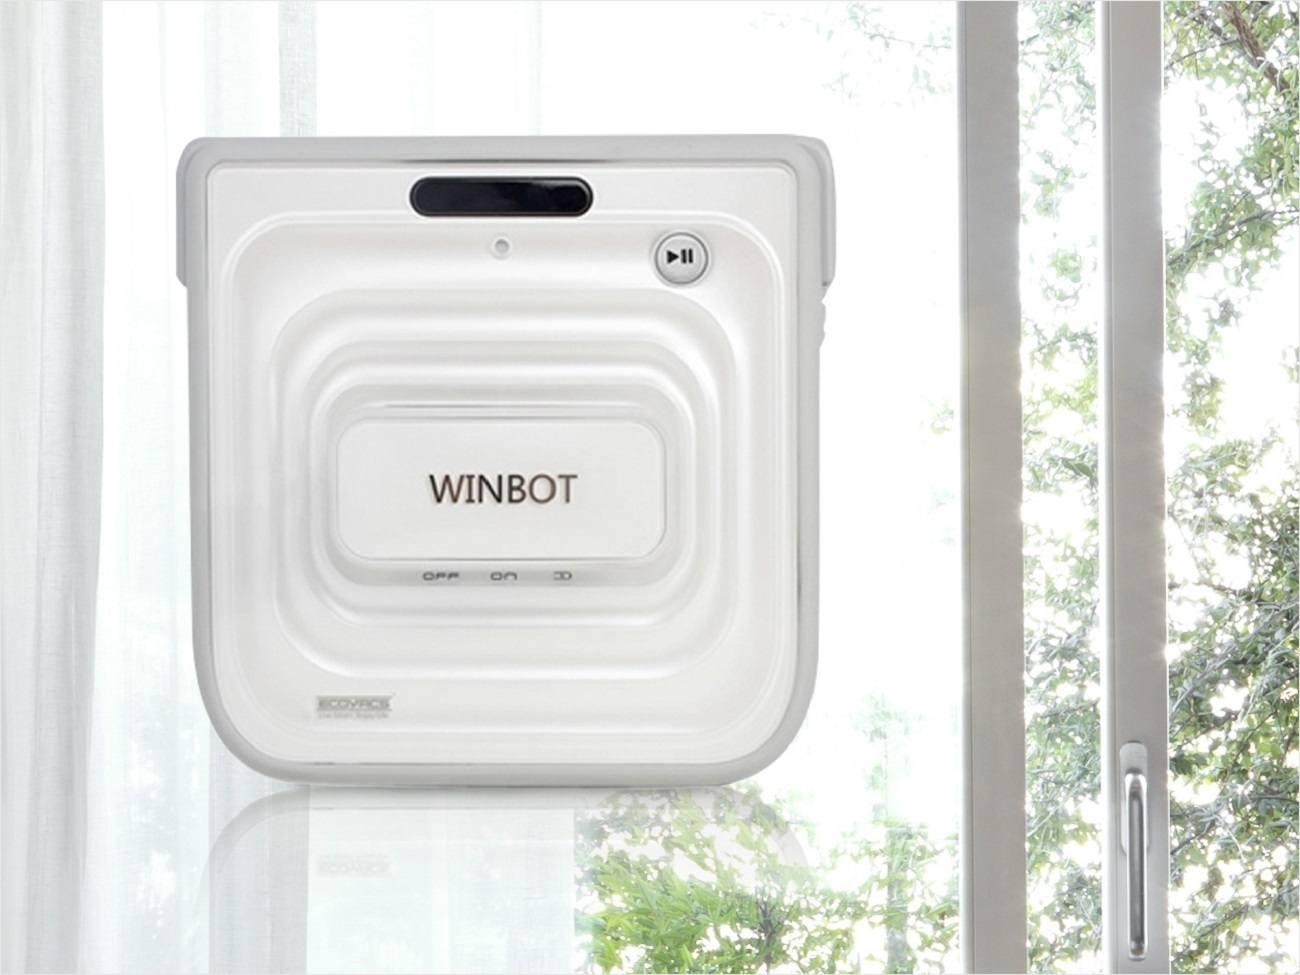 winbot w730 - window cleaning robot, » gadget flow